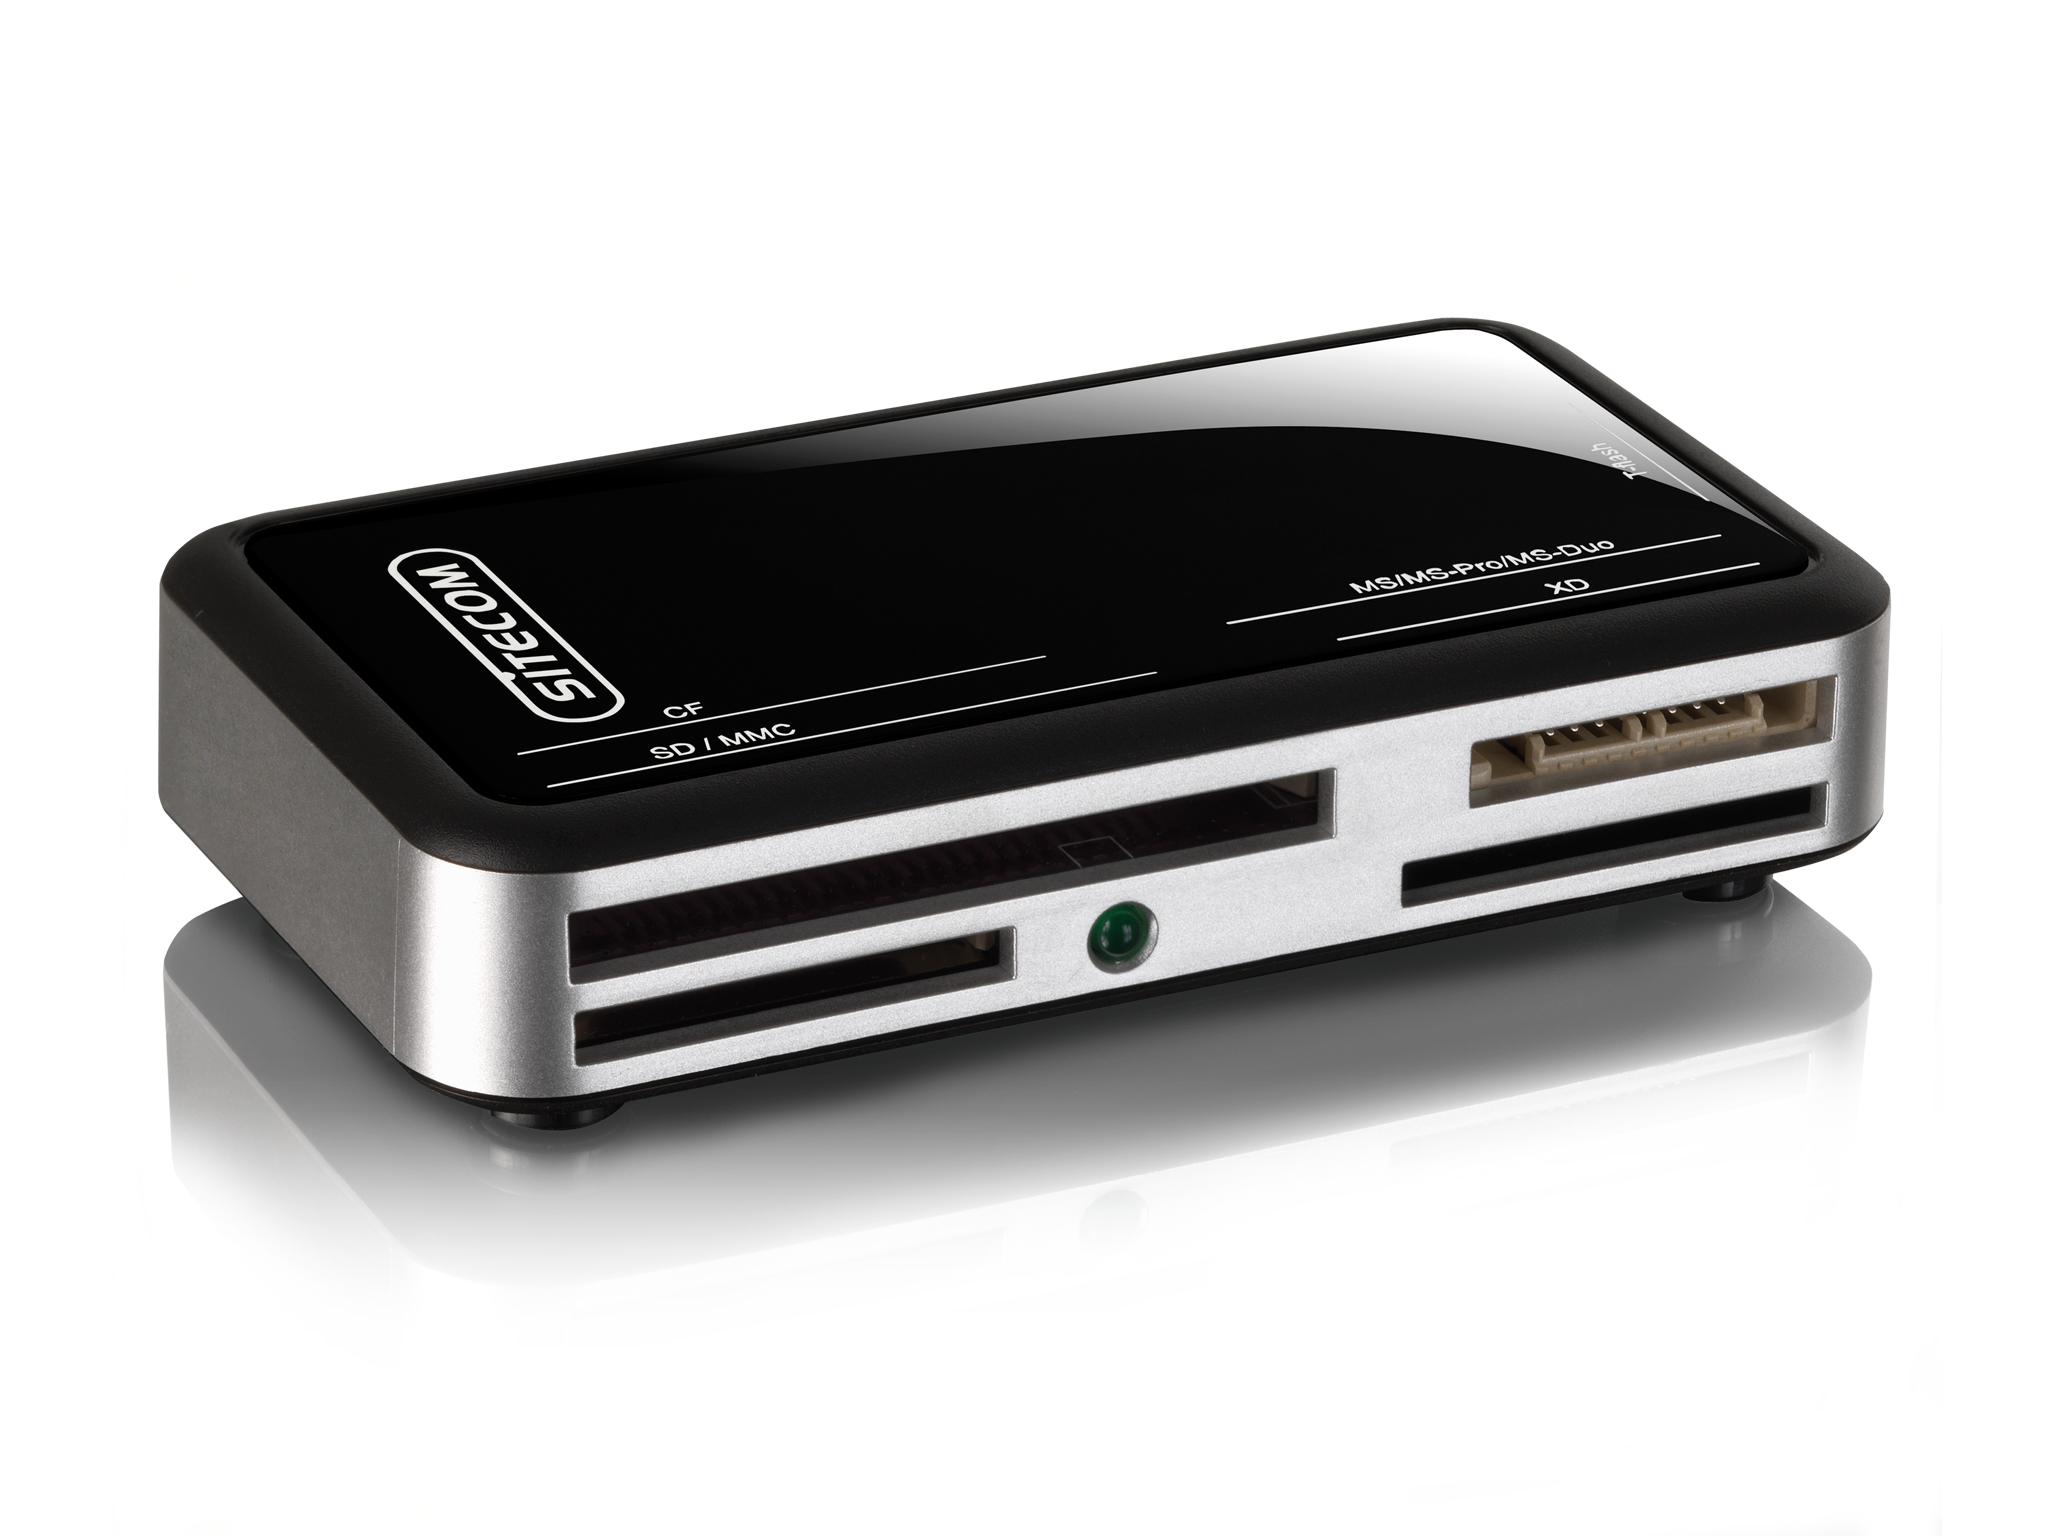 Sitecom USB 3.0 Card Reader 63-in-1 MD-030